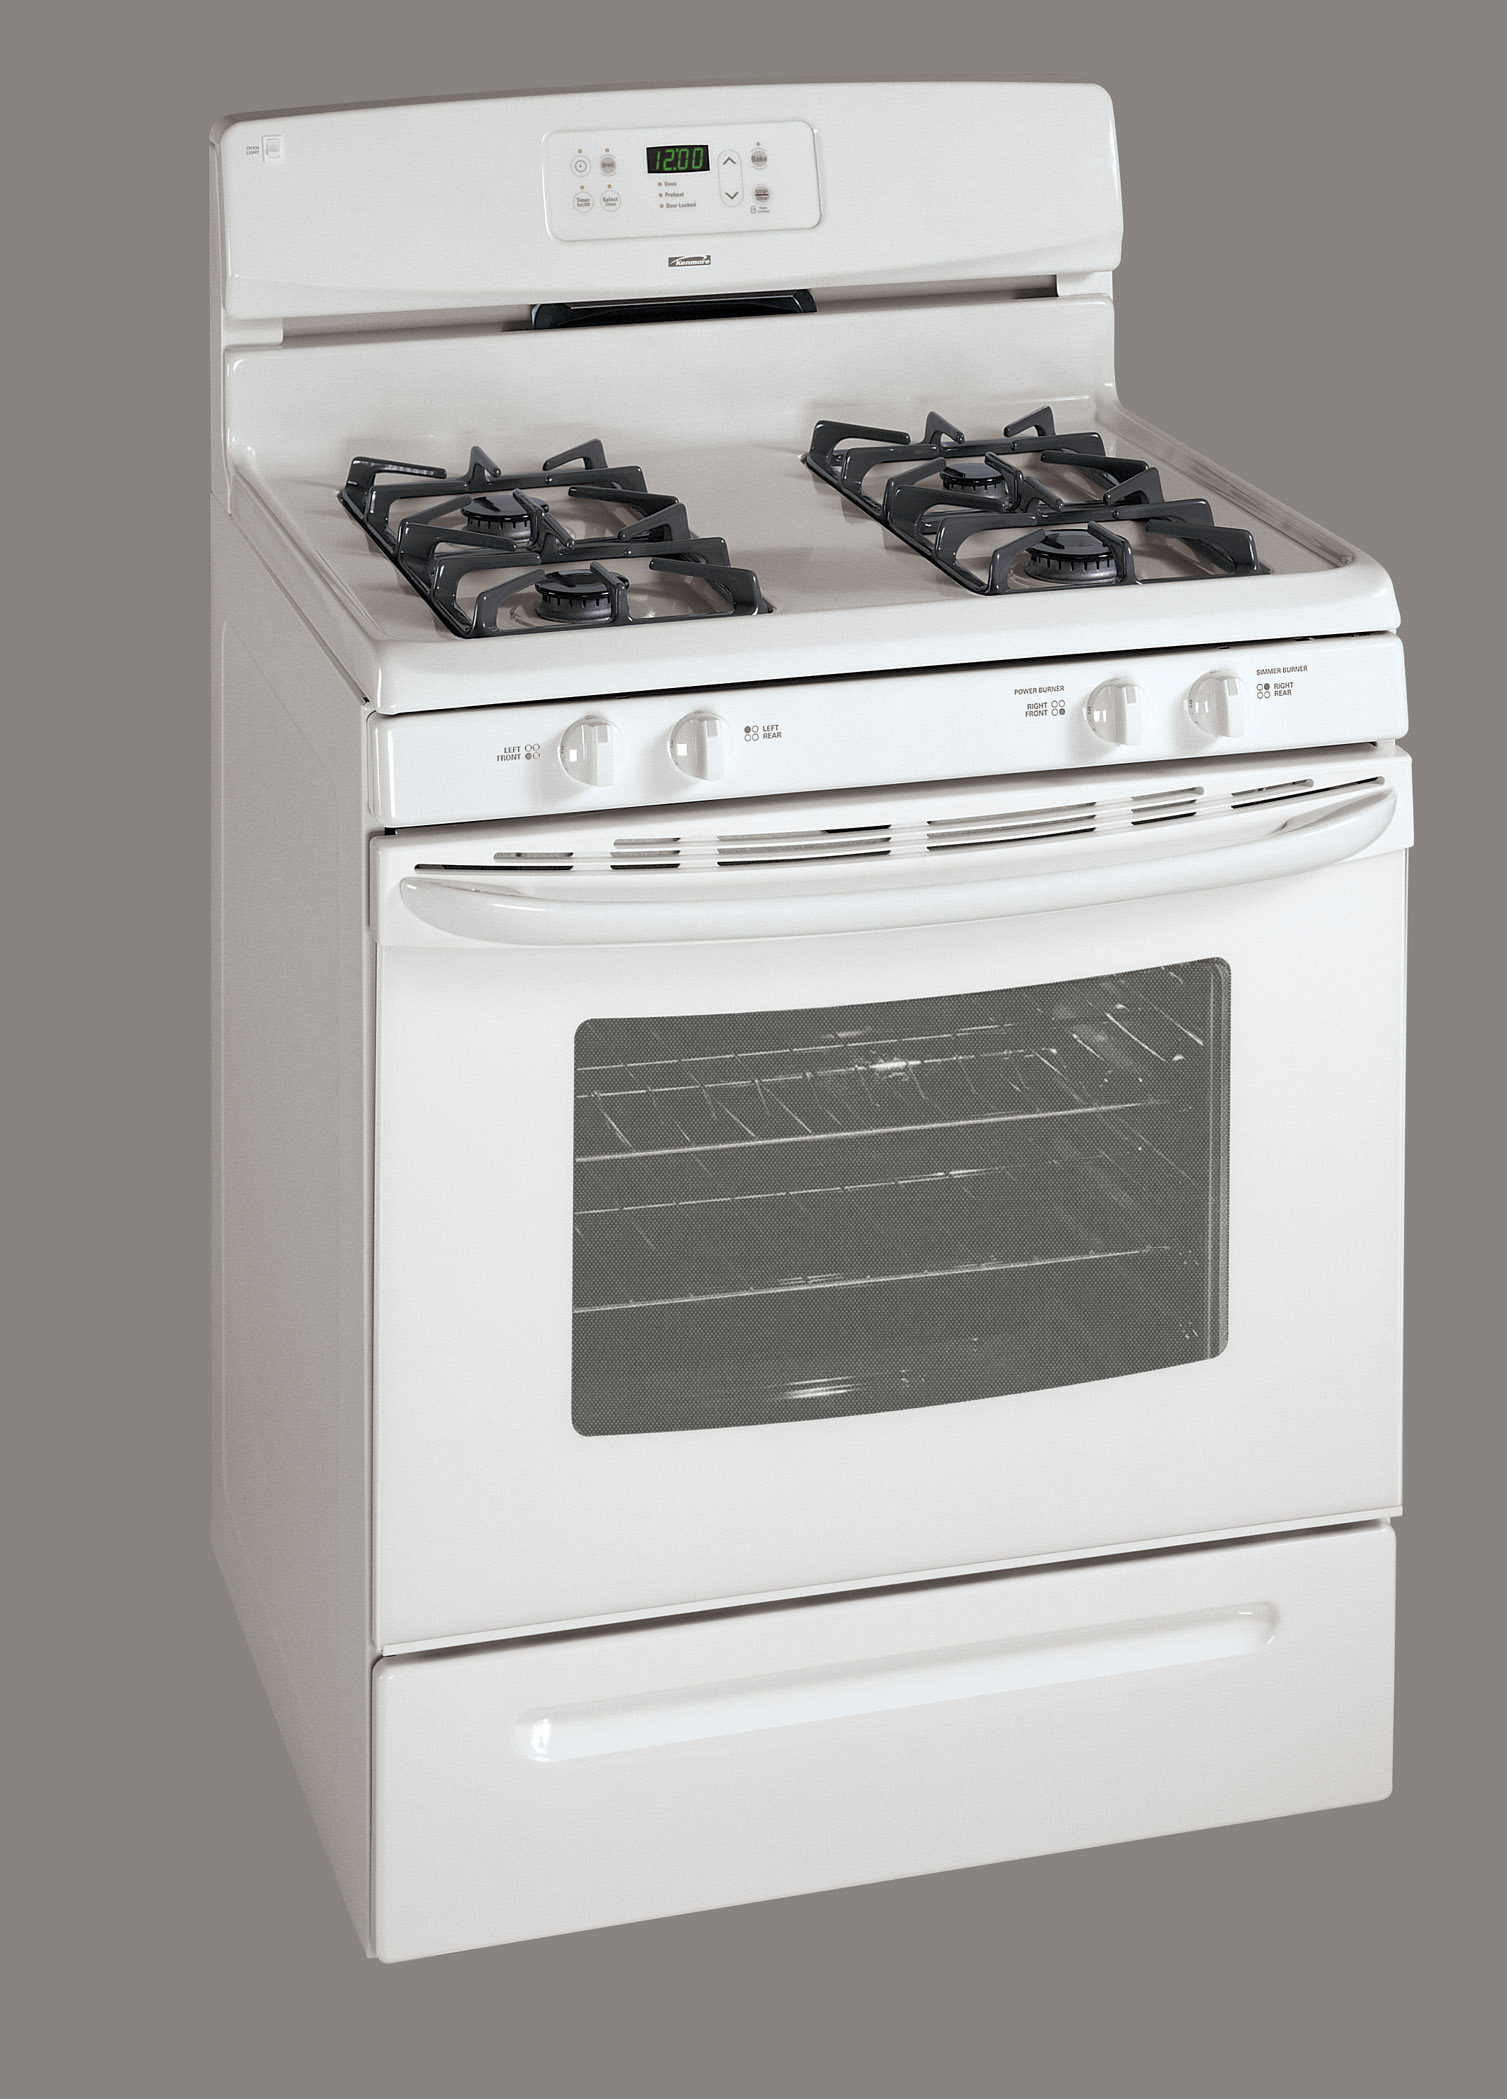 Kenmore Range Stove Oven Model 790 78612400 Parts